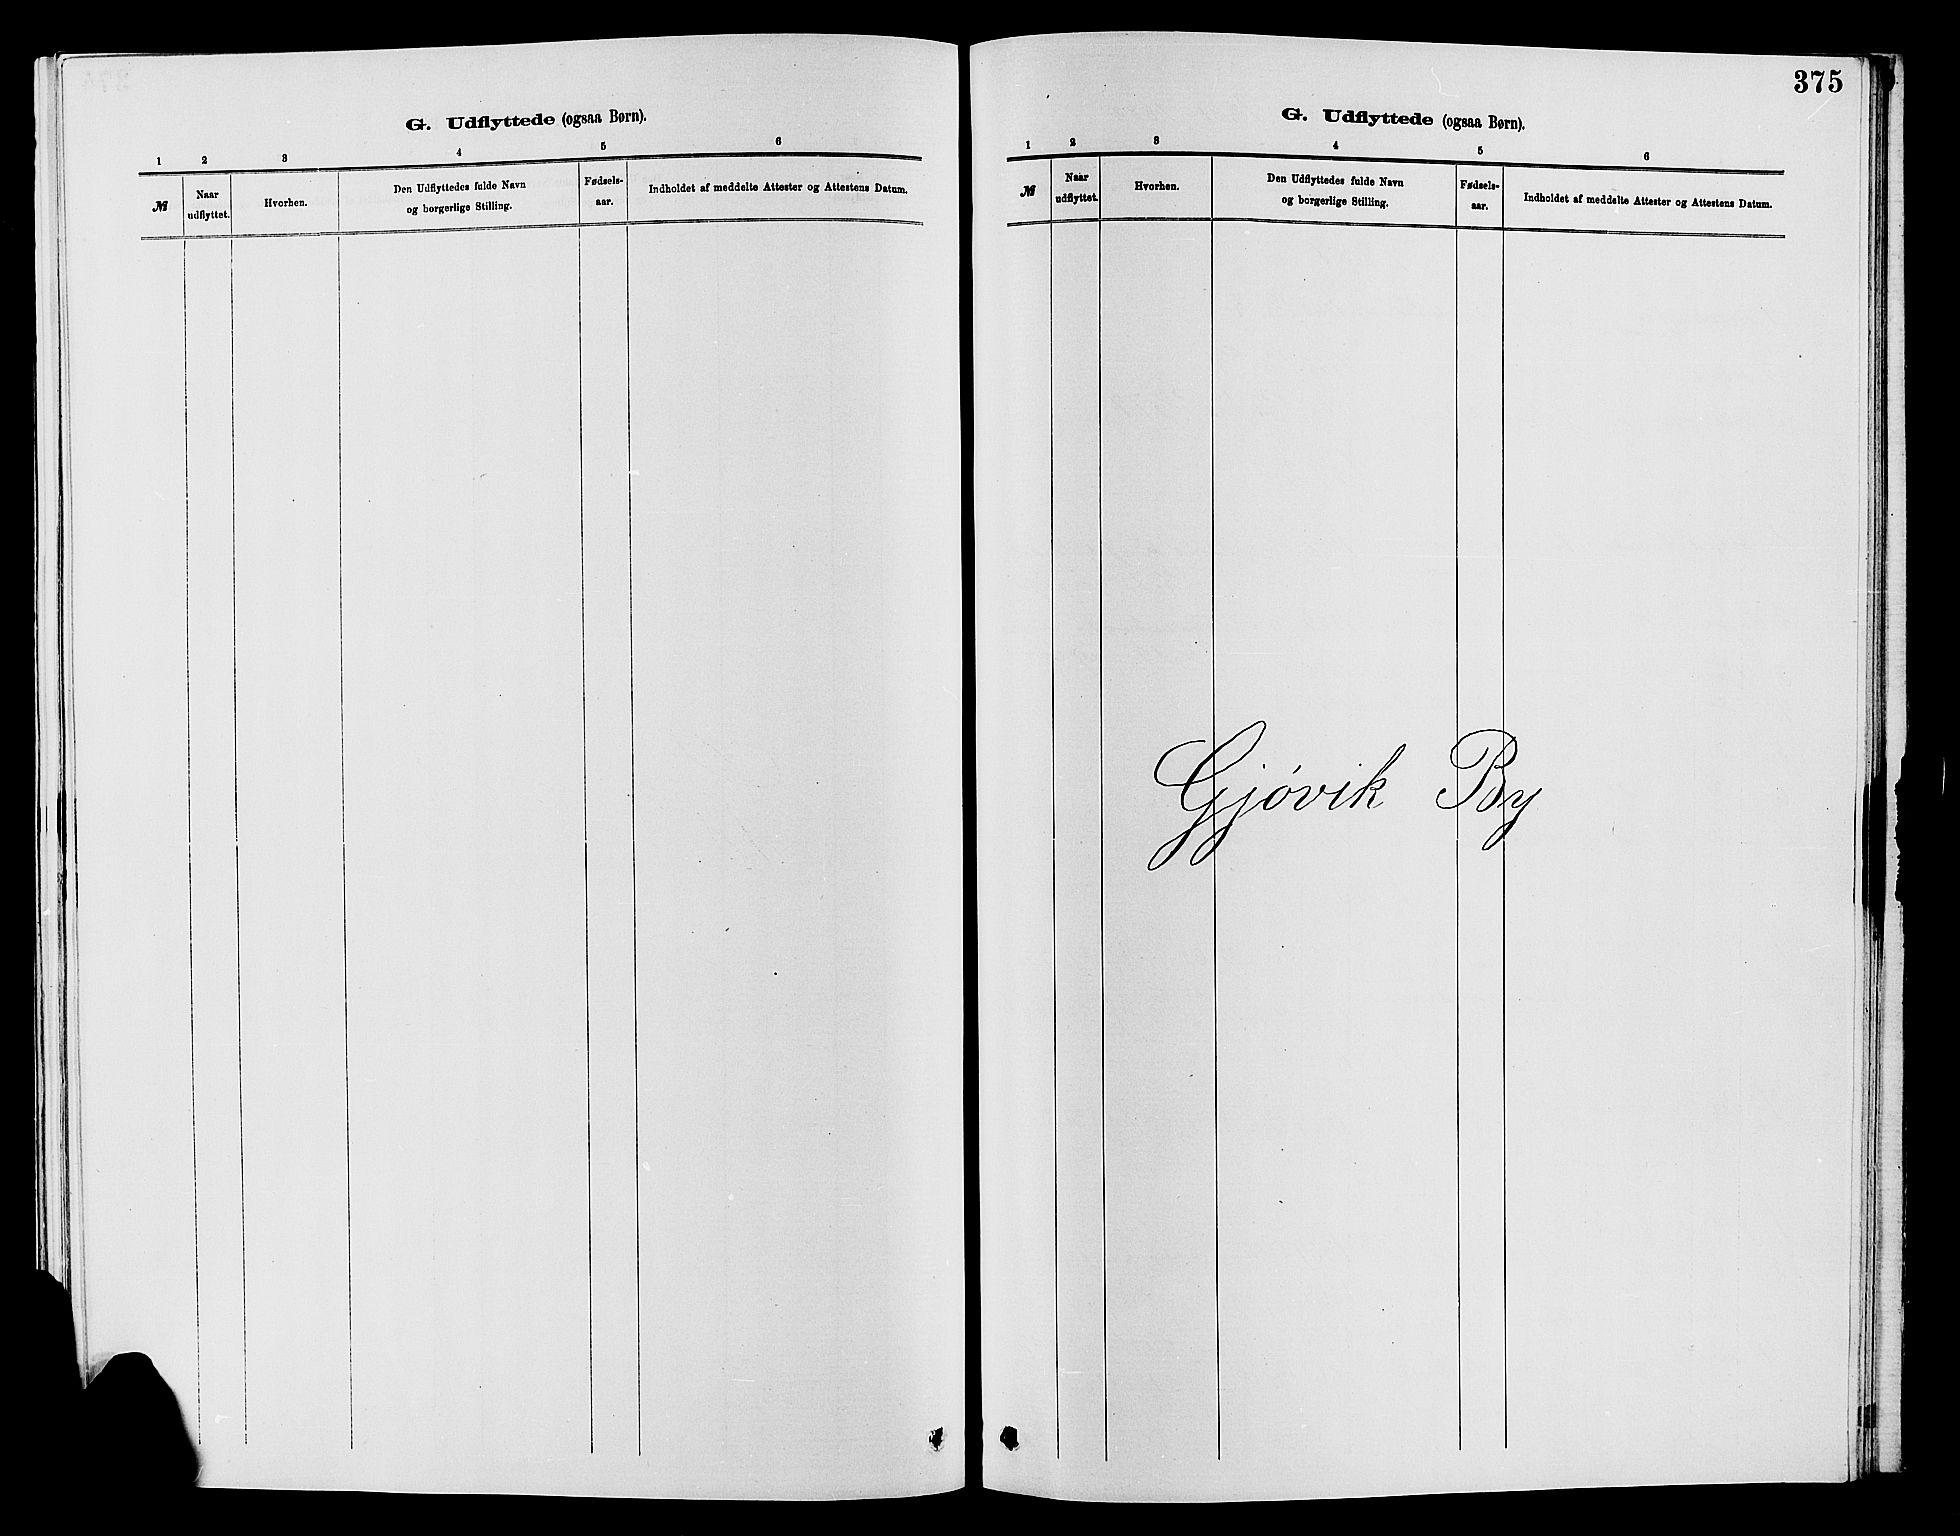 SAH, Vardal prestekontor, H/Ha/Hab/L0007: Klokkerbok nr. 7 /2, 1881-1895, s. 375